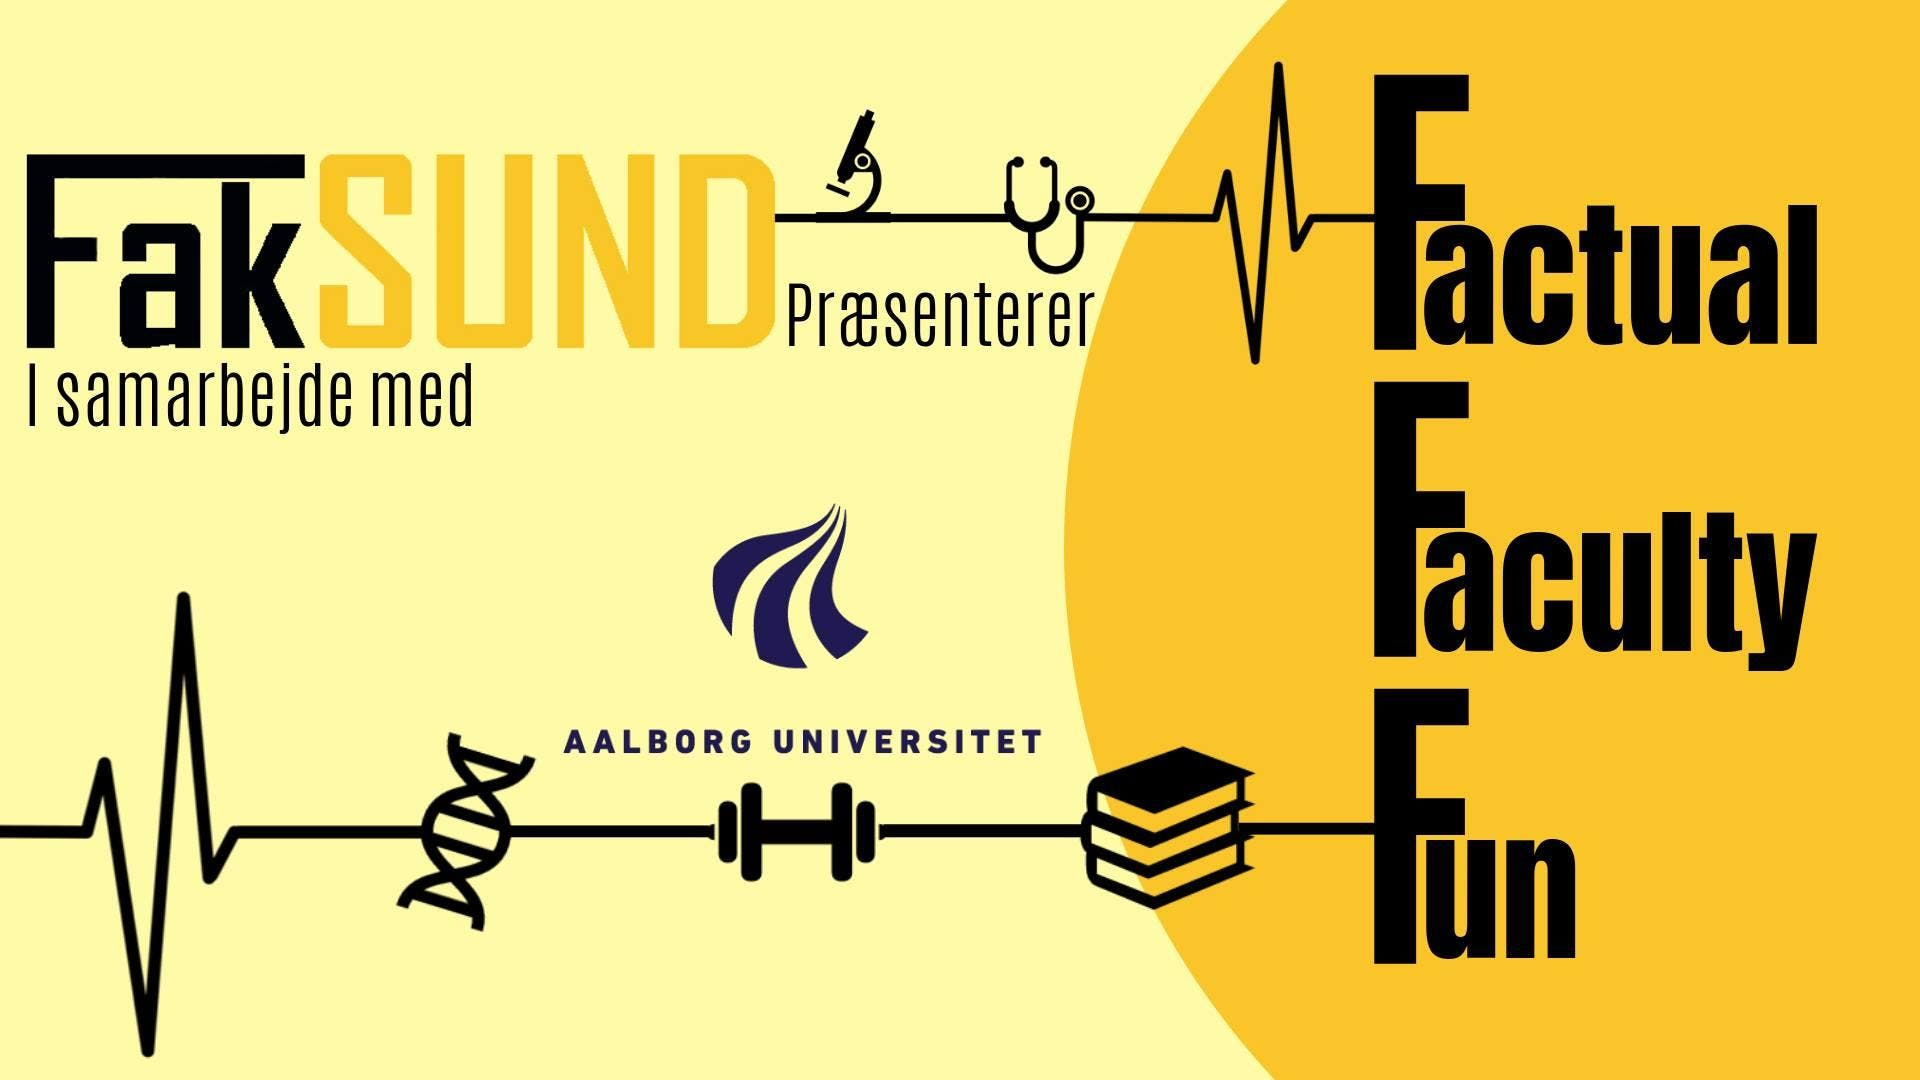 FakSUNDs Factual-Faculty-Fun